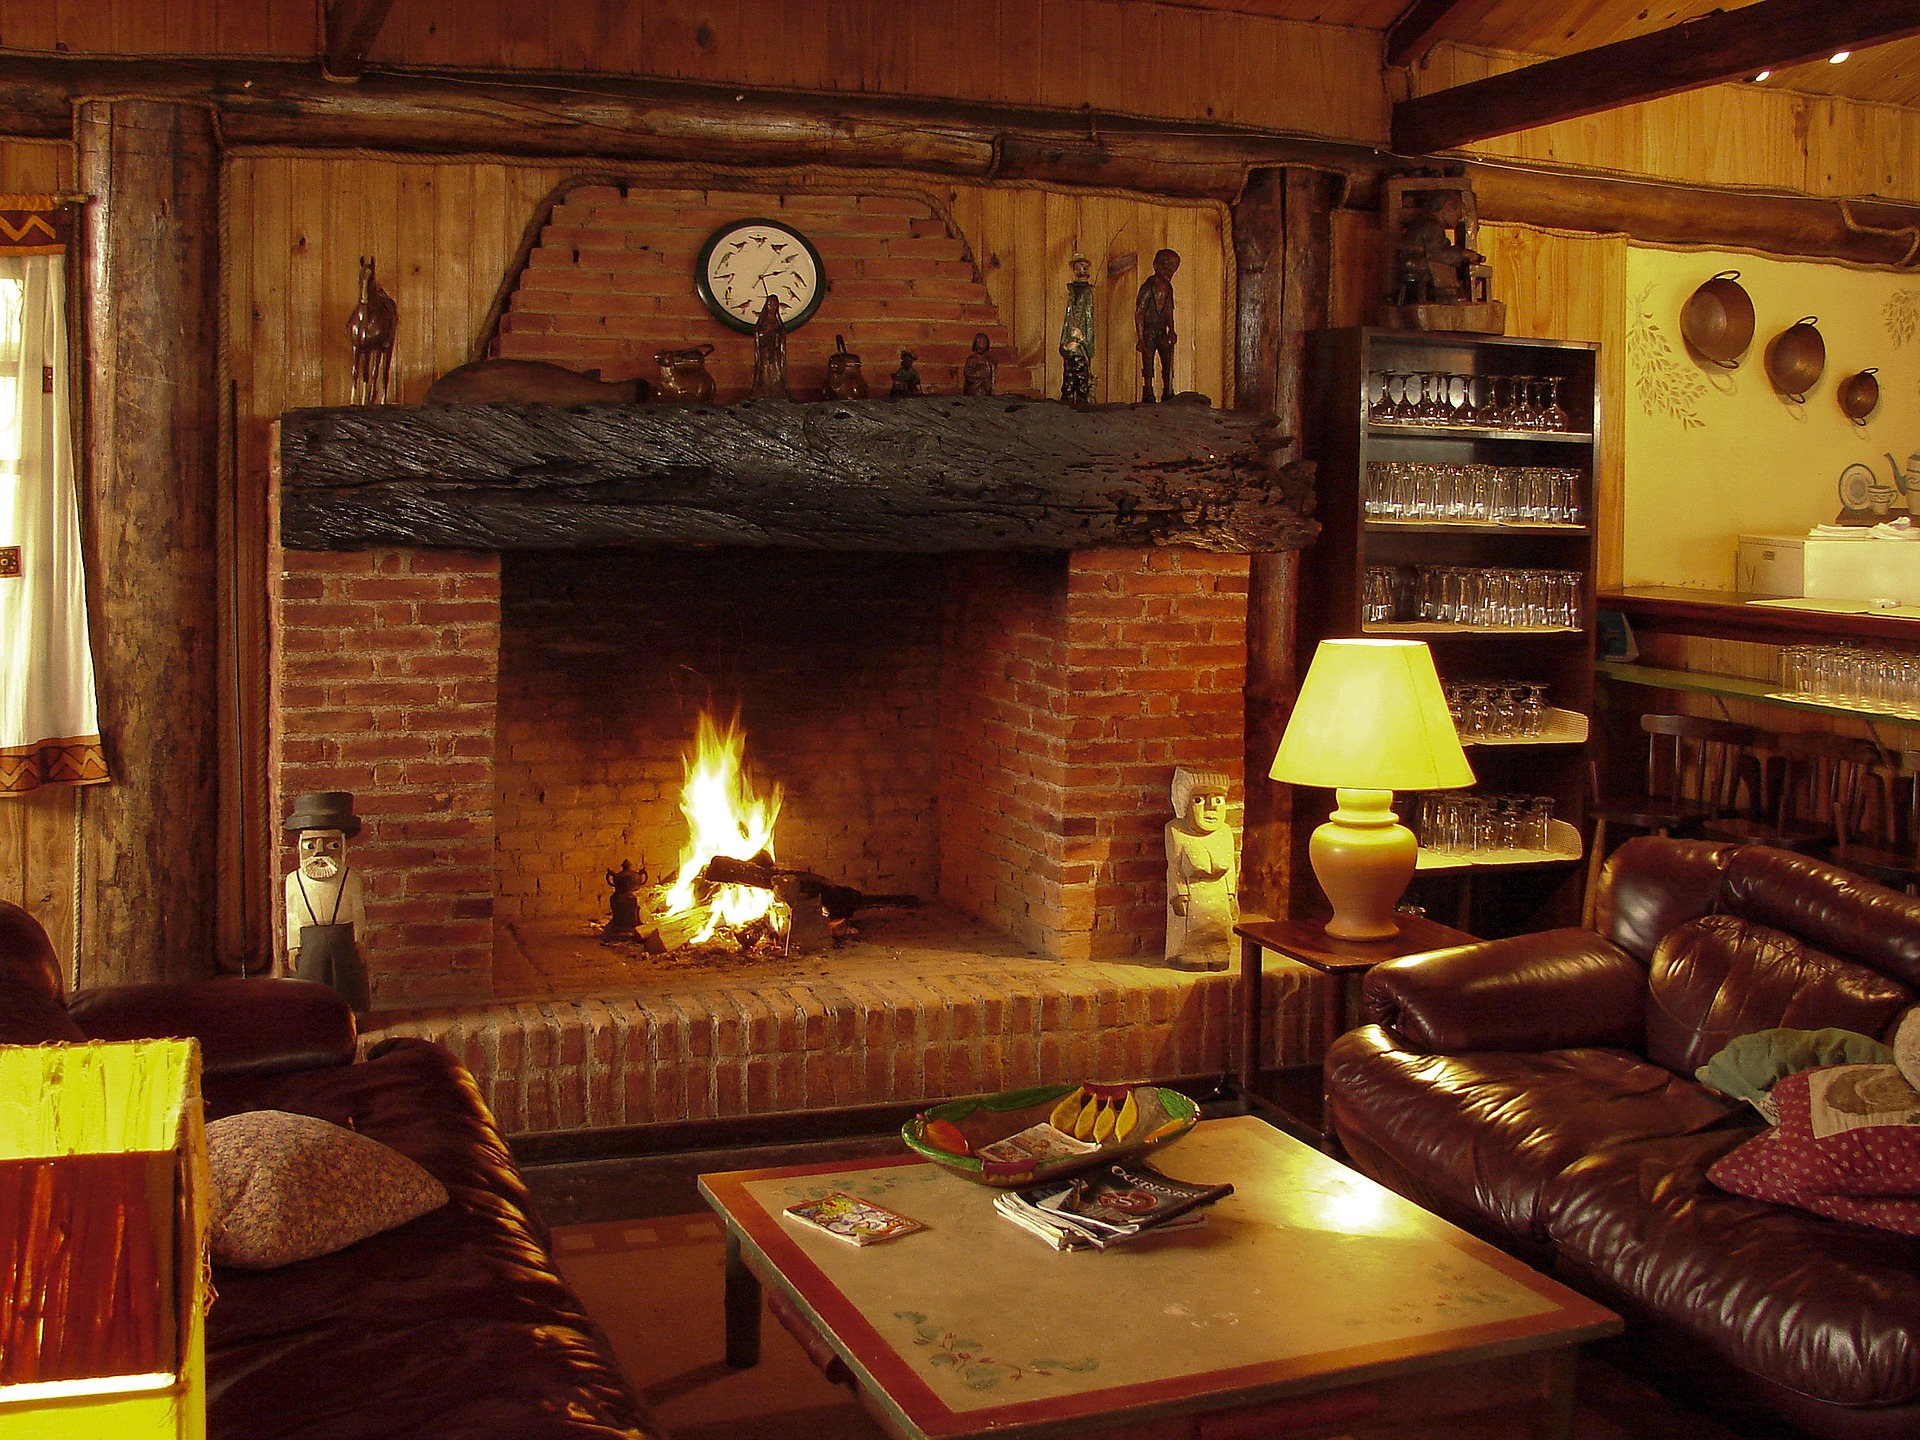 fireplace-1741208_1920.jpg